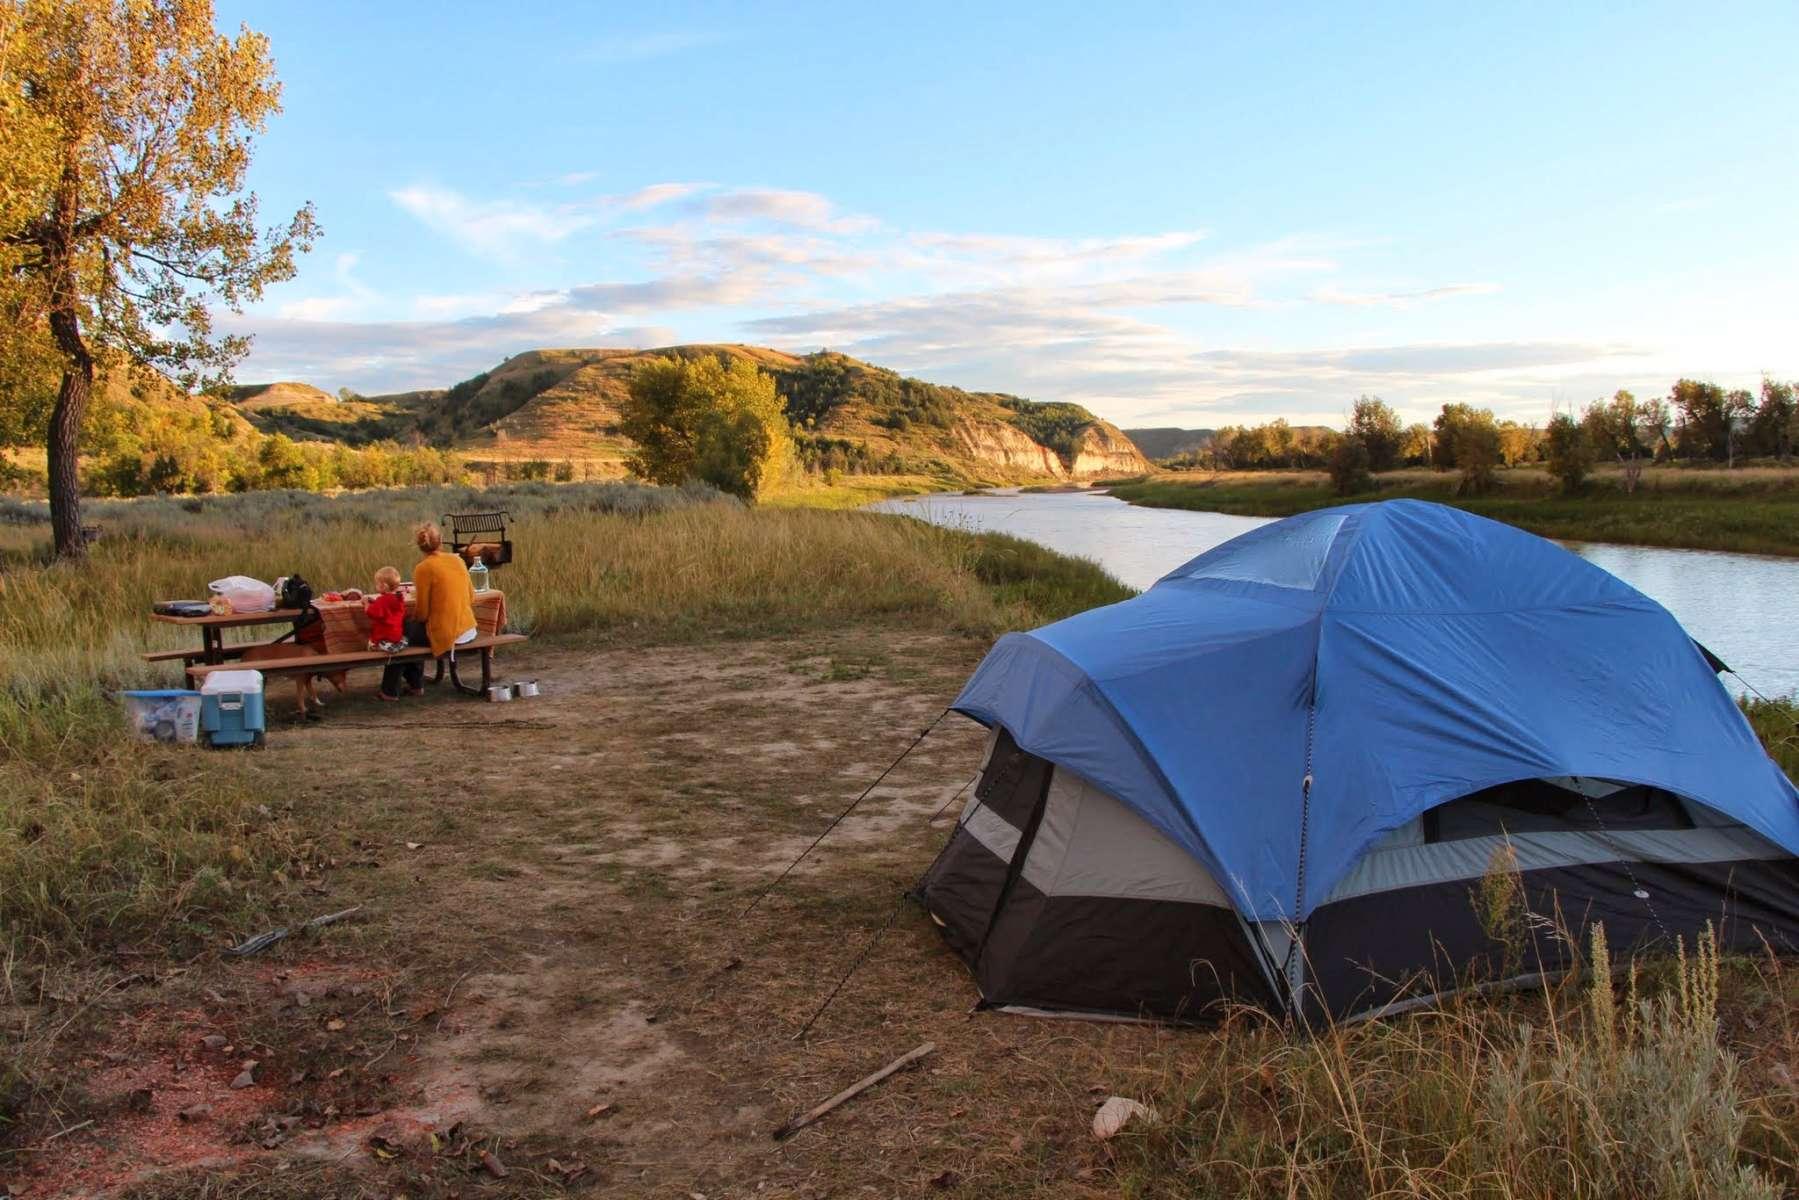 Cottonwood Campground Theodore Roosevelt Park ND 1 Hipcamper